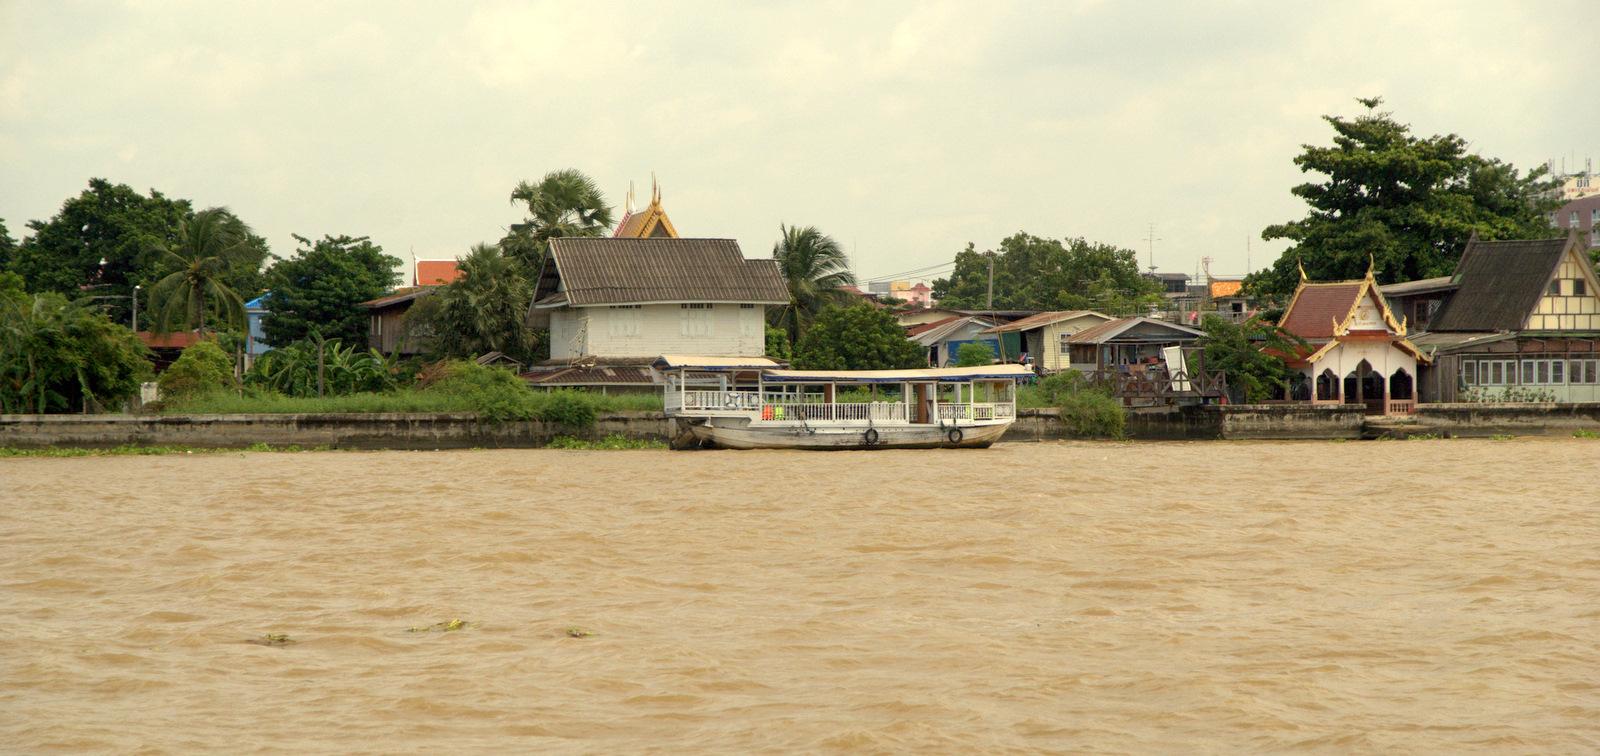 Bangkok (ostatni spacer autobusem i rzeką) 9